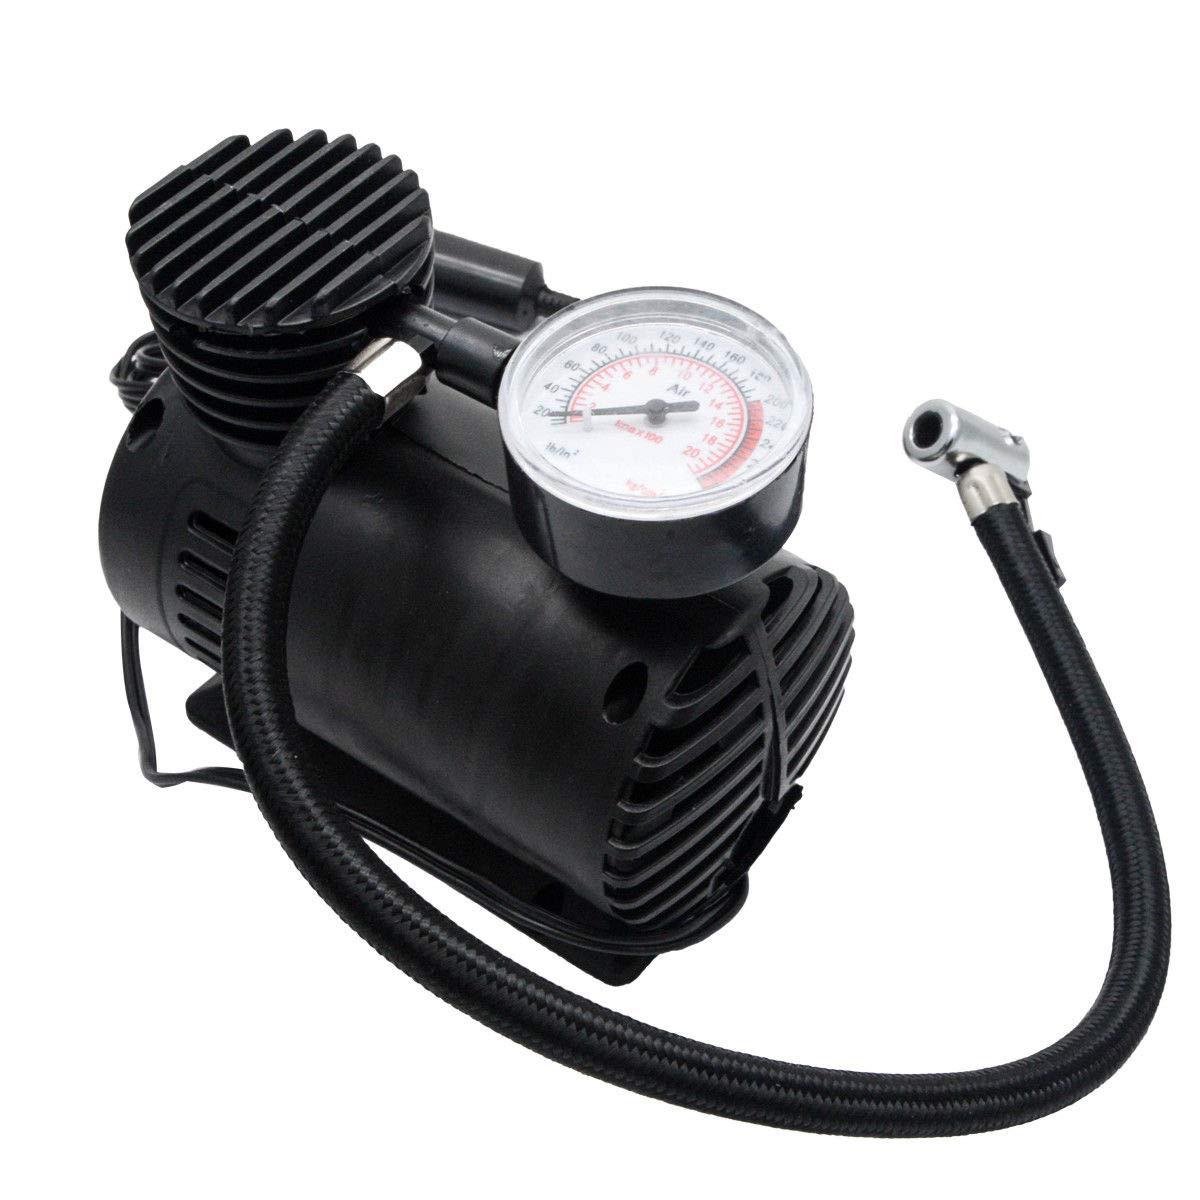 el/éctrico 300 psi compacto port/átil Maso Compresor de aire para coche 12 V inflador de neum/áticos con man/ómetro de presi/ón